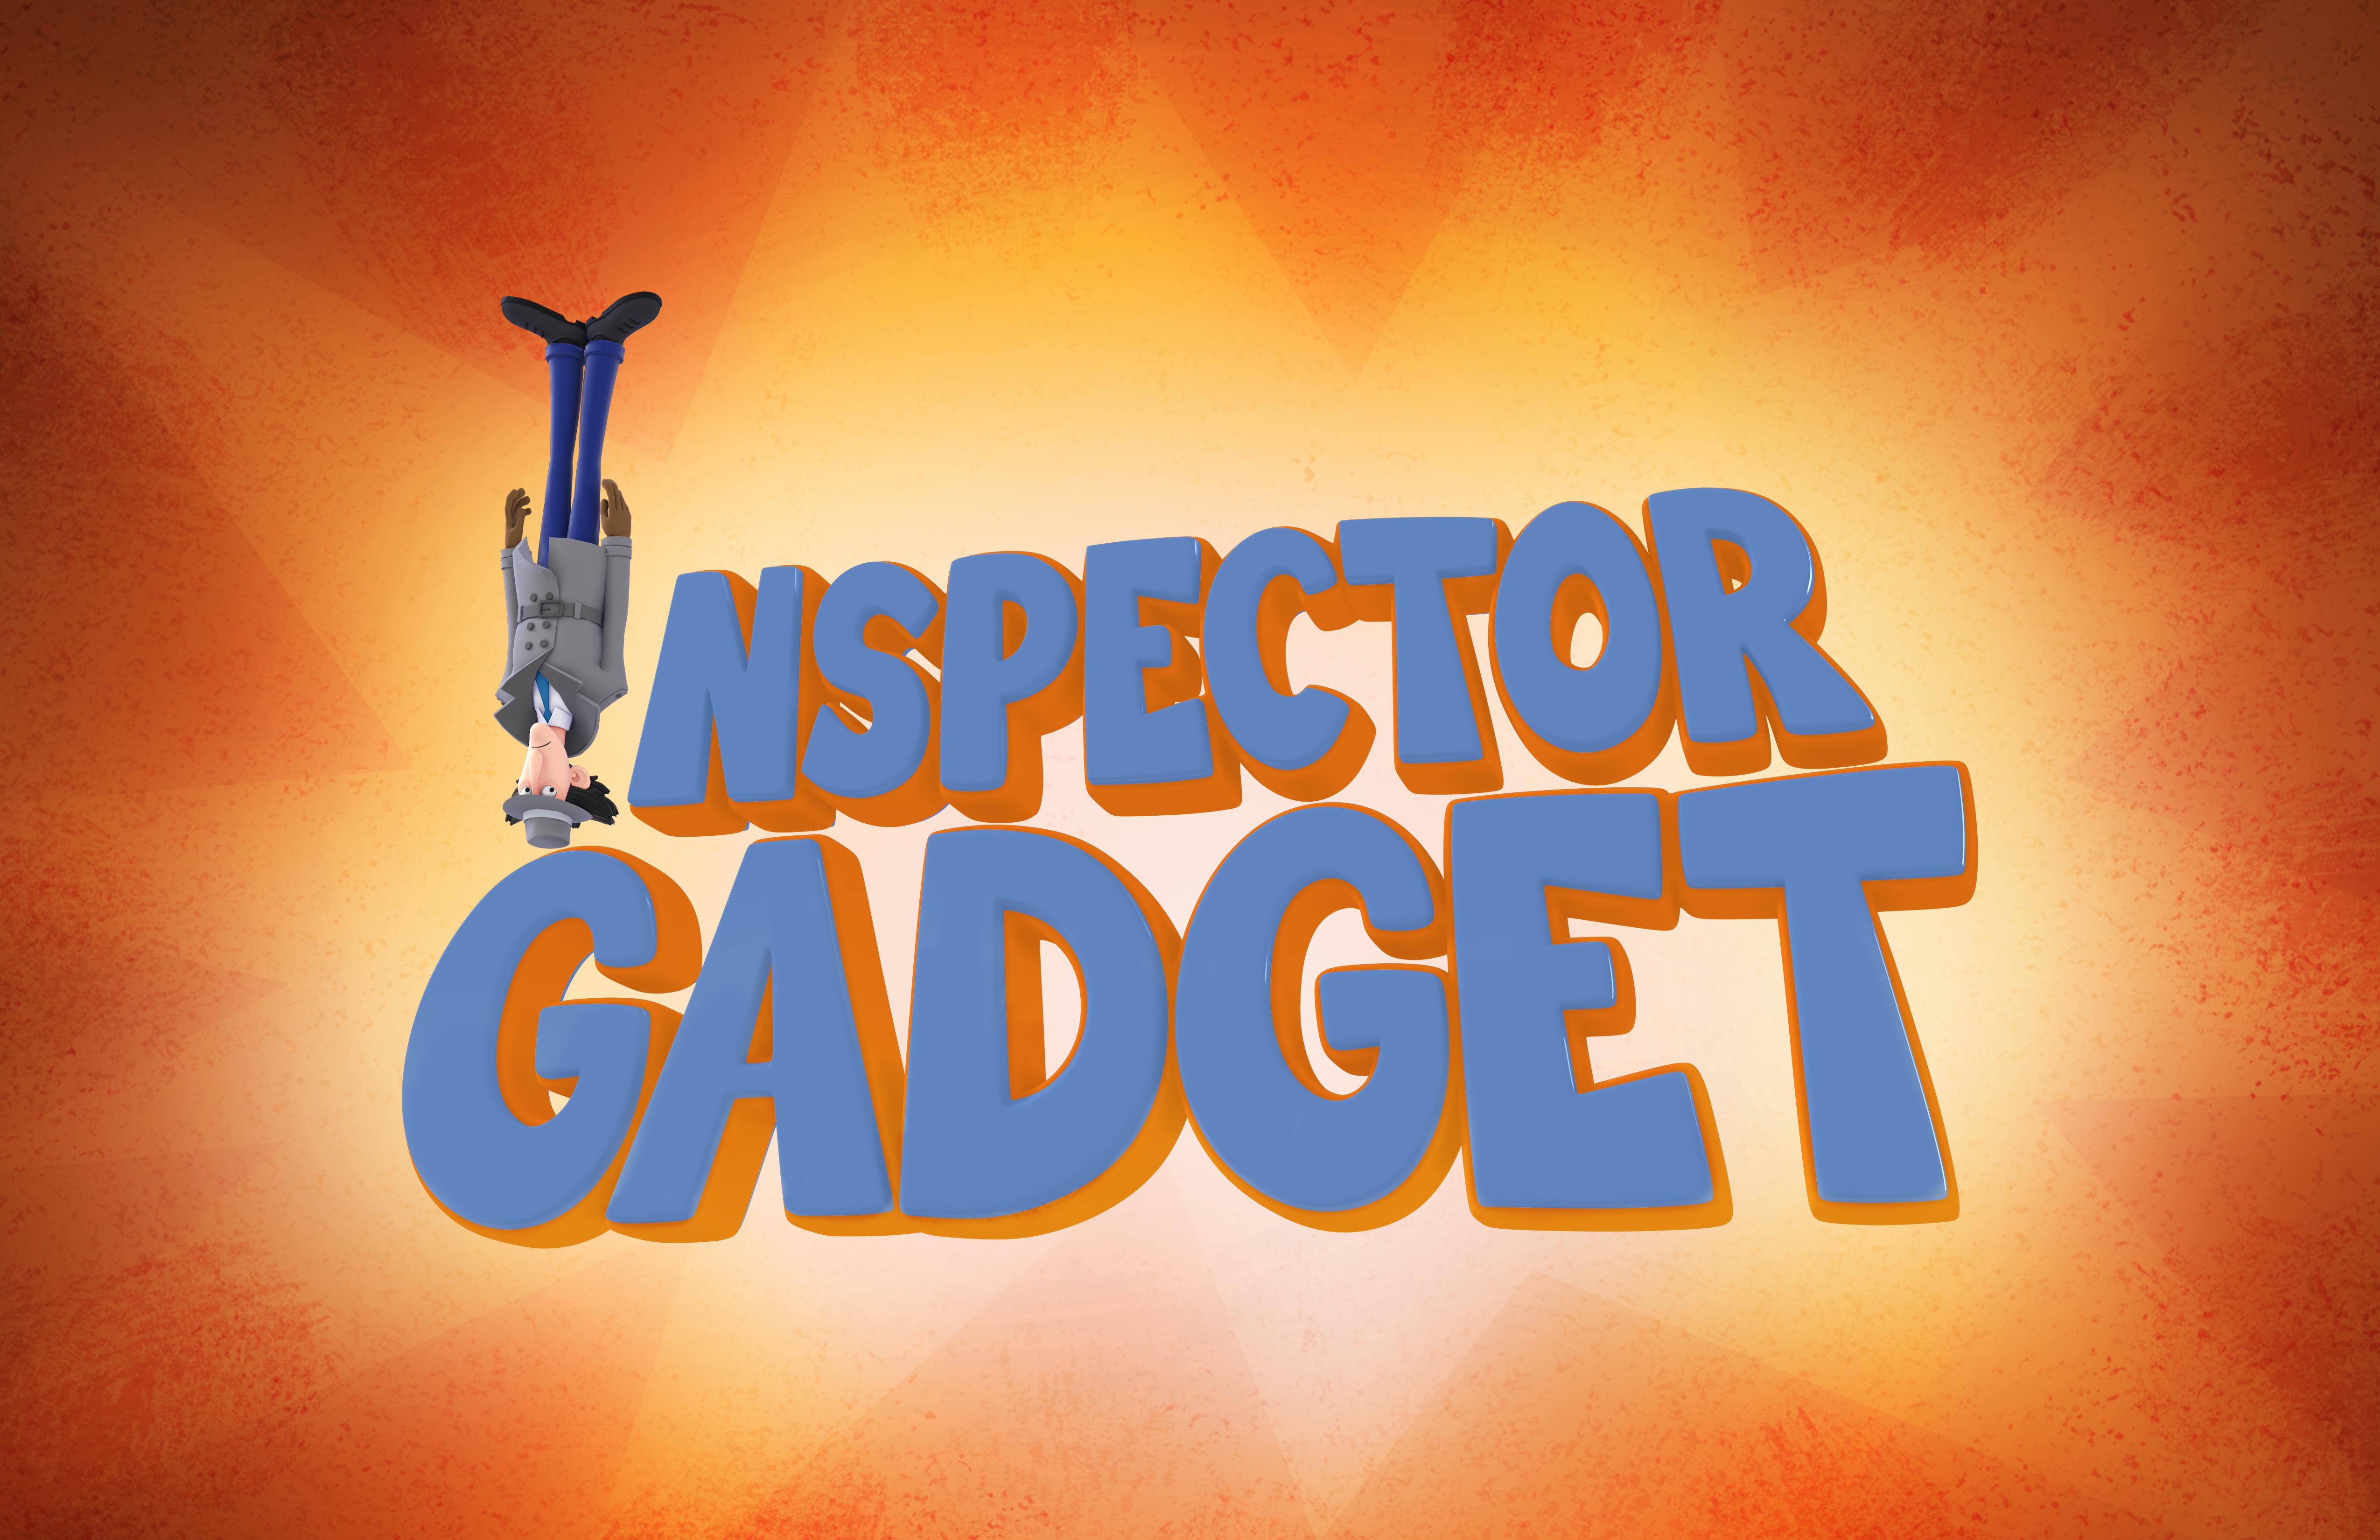 img_gadget_title_logo_3d_v01_2014_0-prsrm.jpg